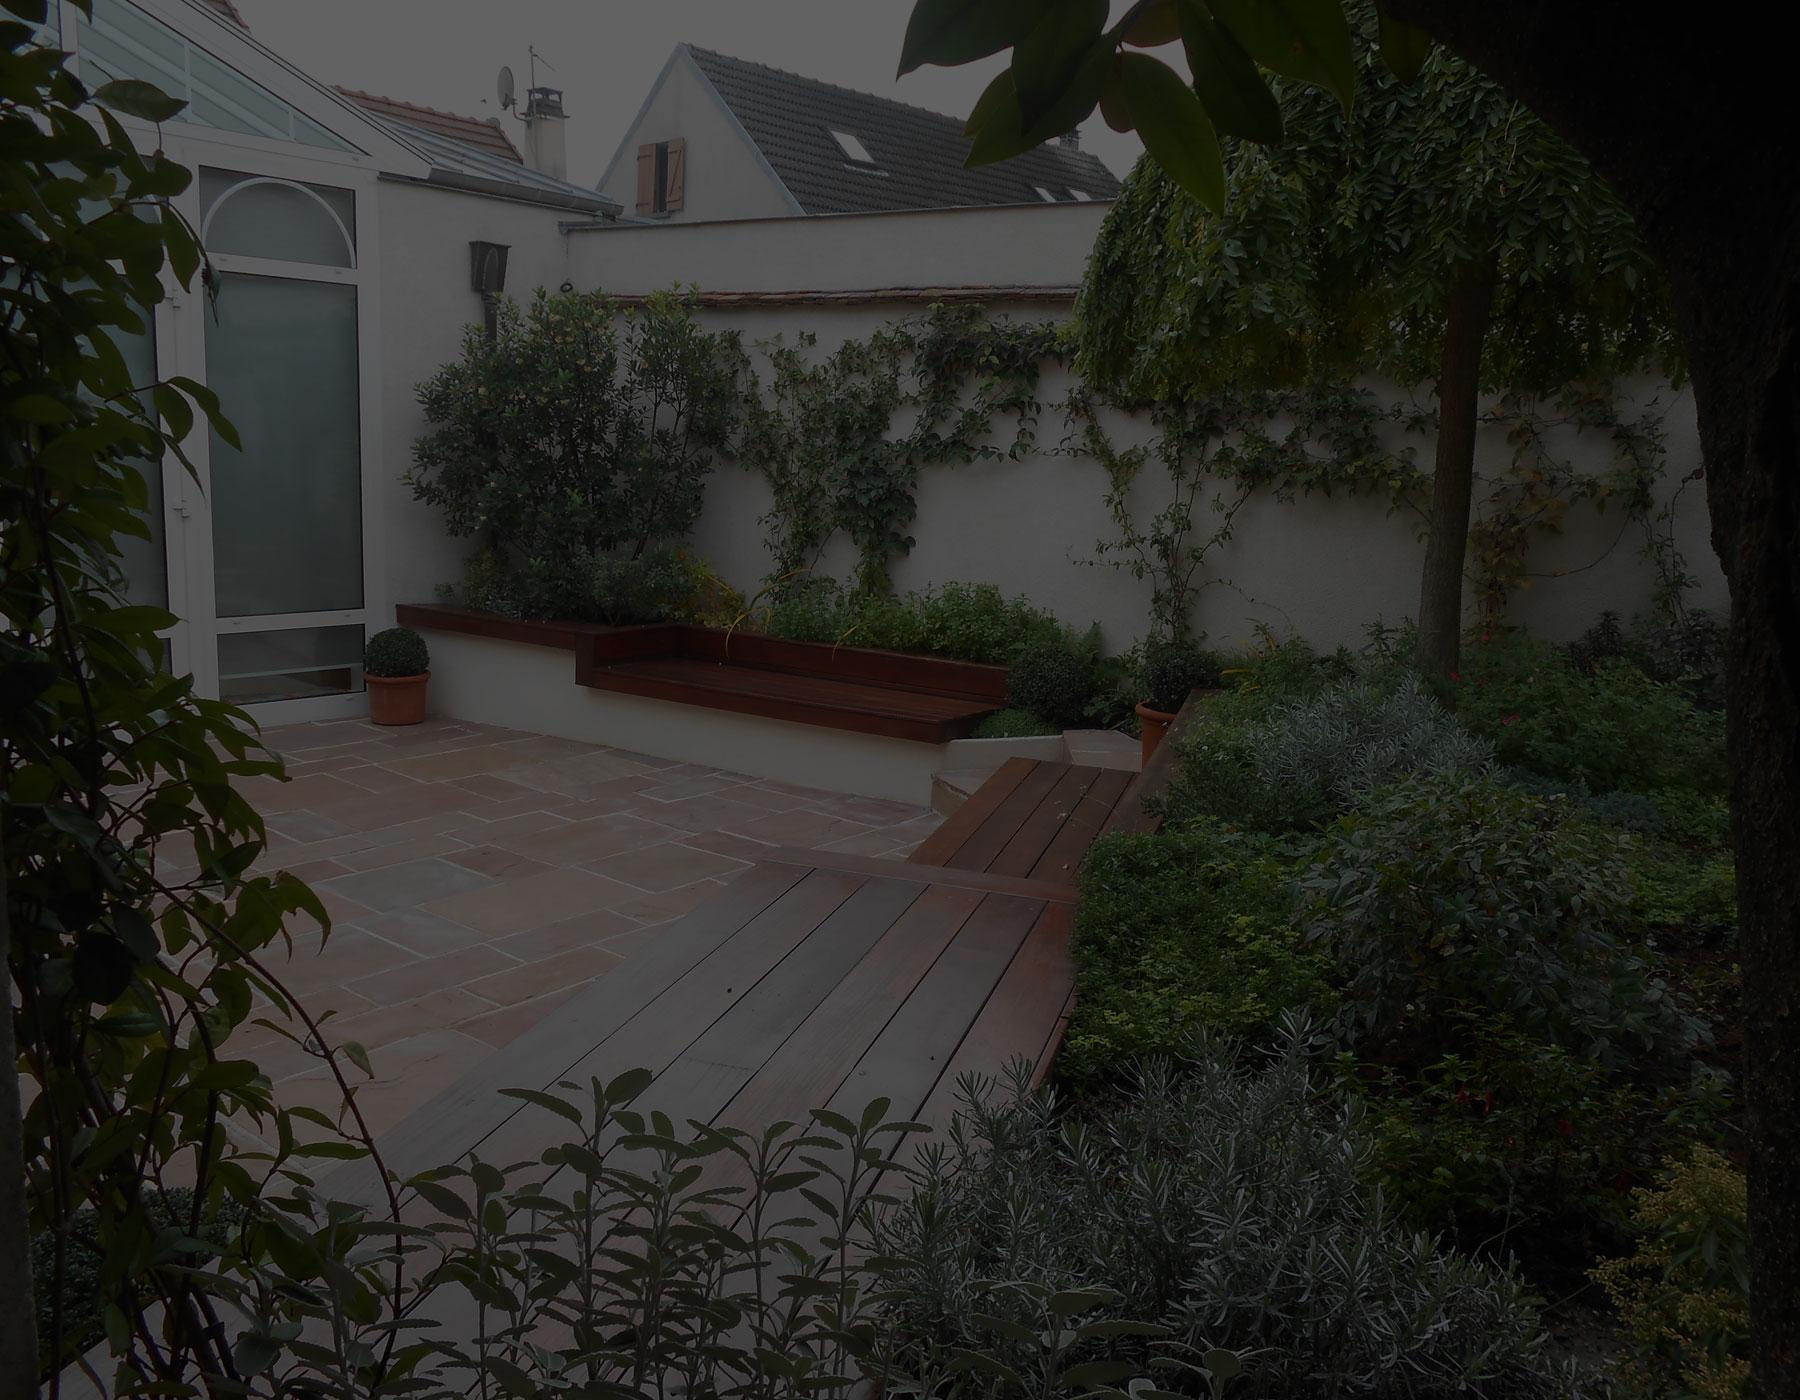 Paysagiste paris 10 cr ation am nagement jardin boulogne - Castorama deco jardin boulogne billancourt ...